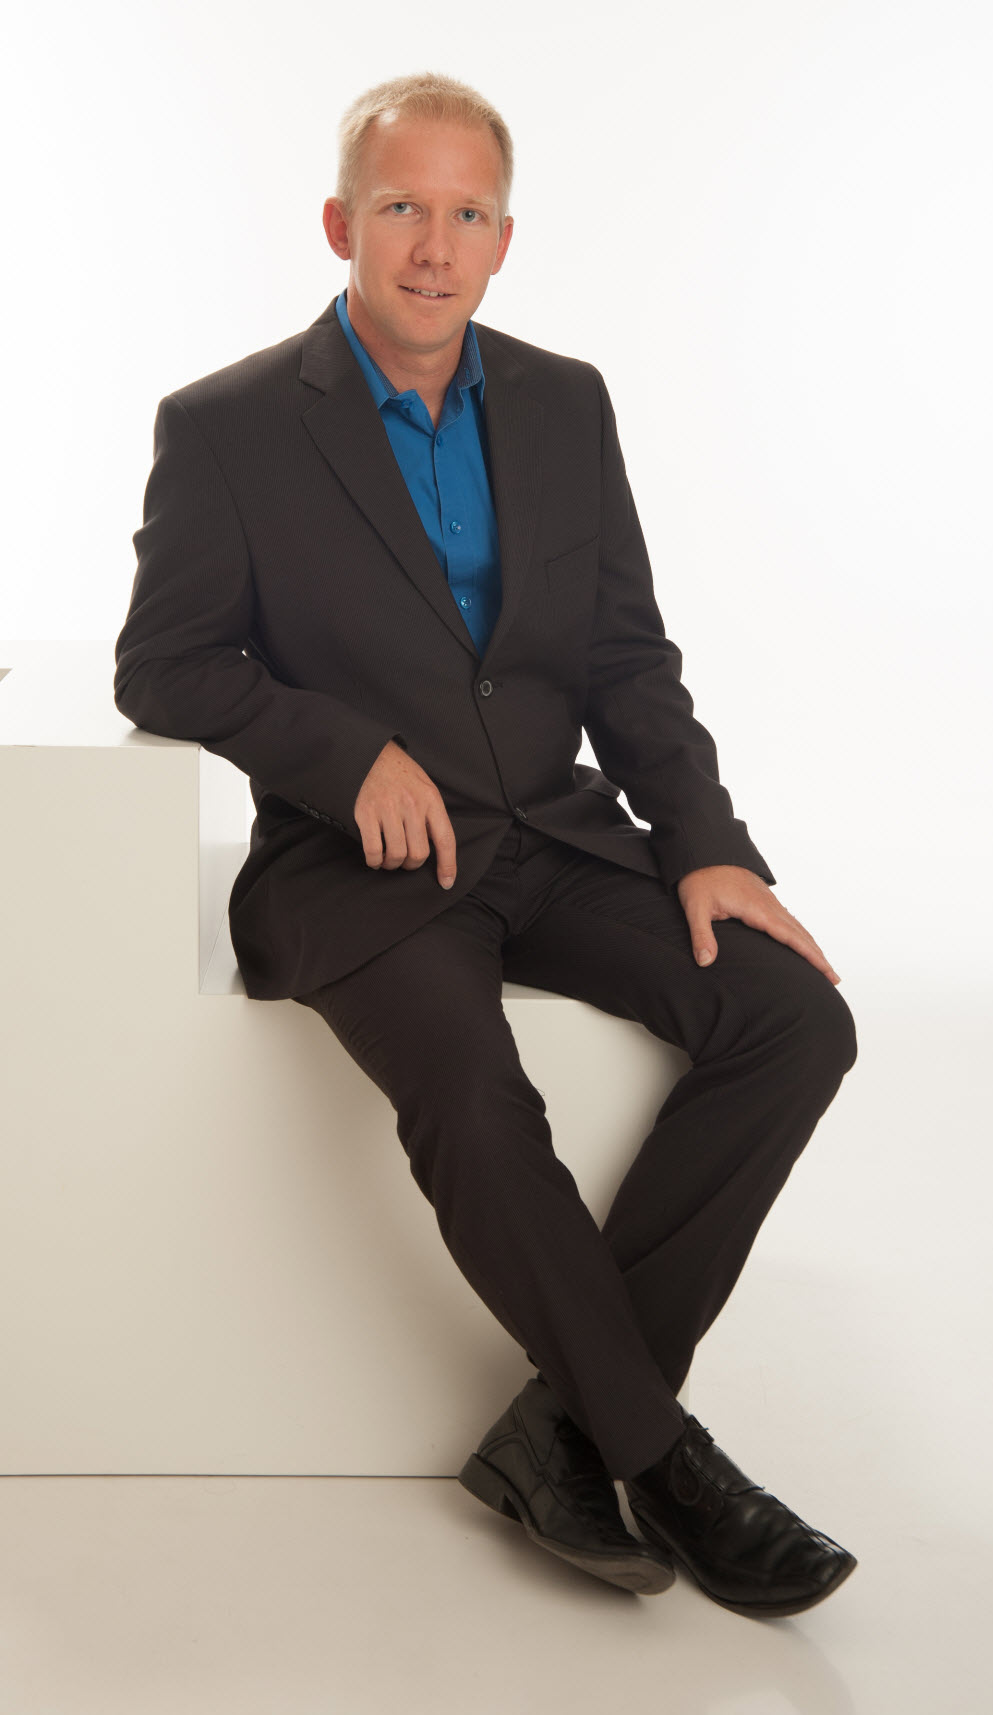 Tom Serroels - SAP coach